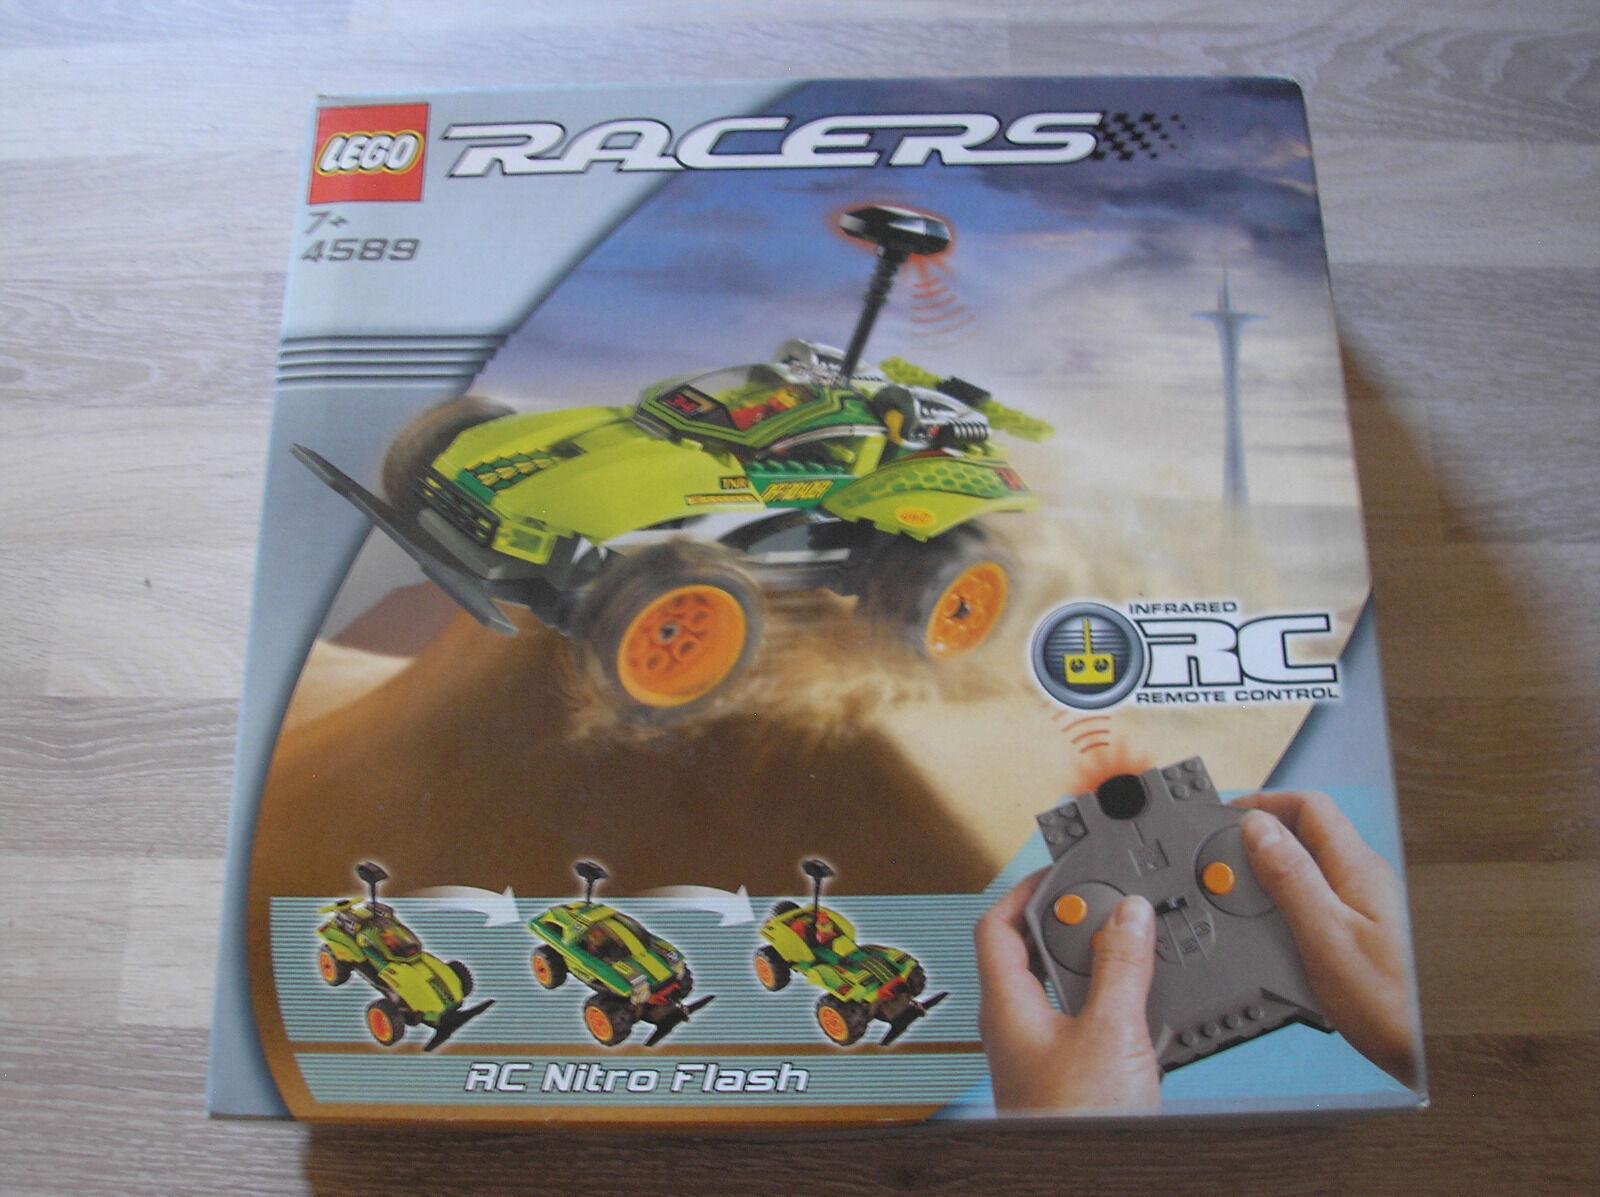 Lego Racers 4589 RC Nitro Nitro Nitro Flash   NEU & OVP - RARITÄT 7a7e0c